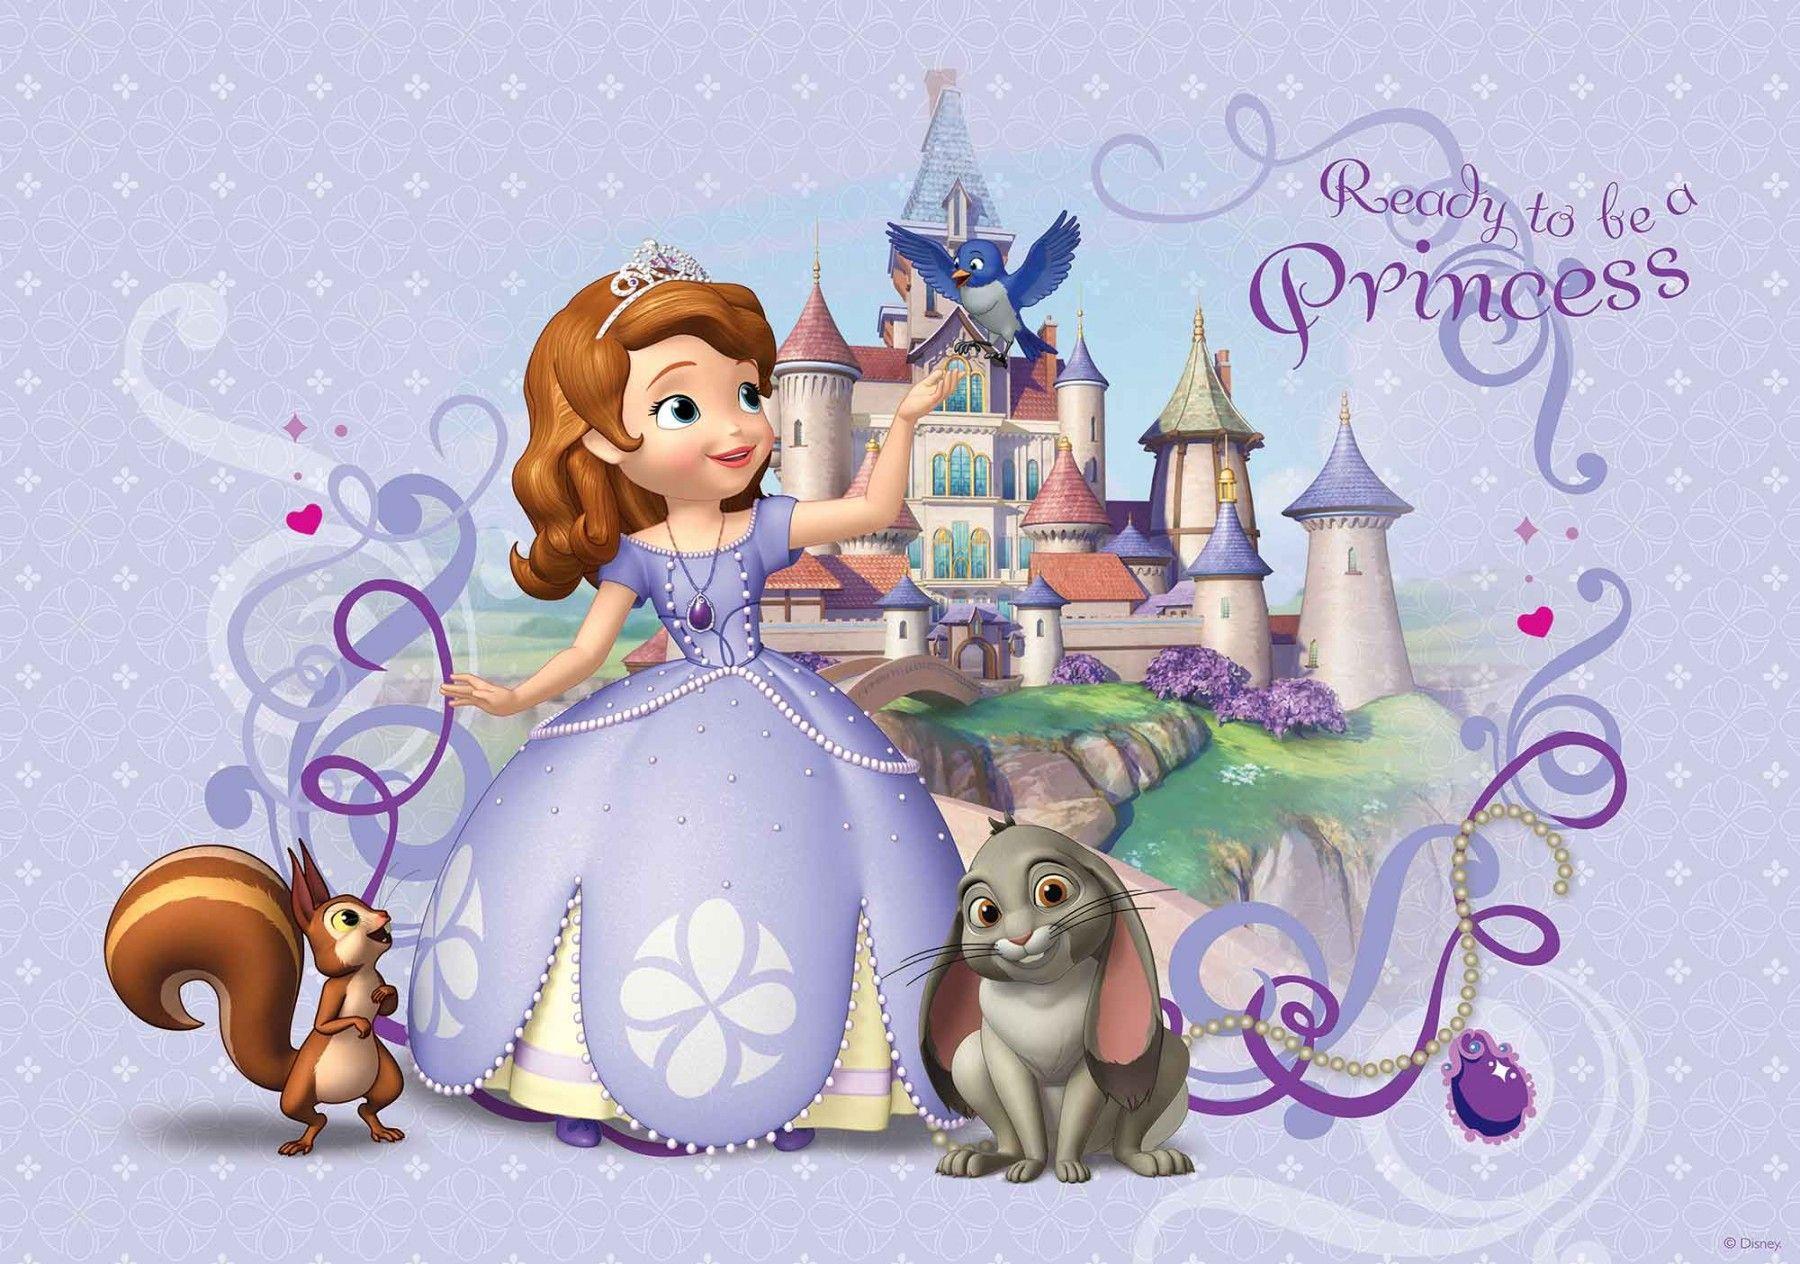 Castle Princess Sofia The First Clover Backdrops High Quality